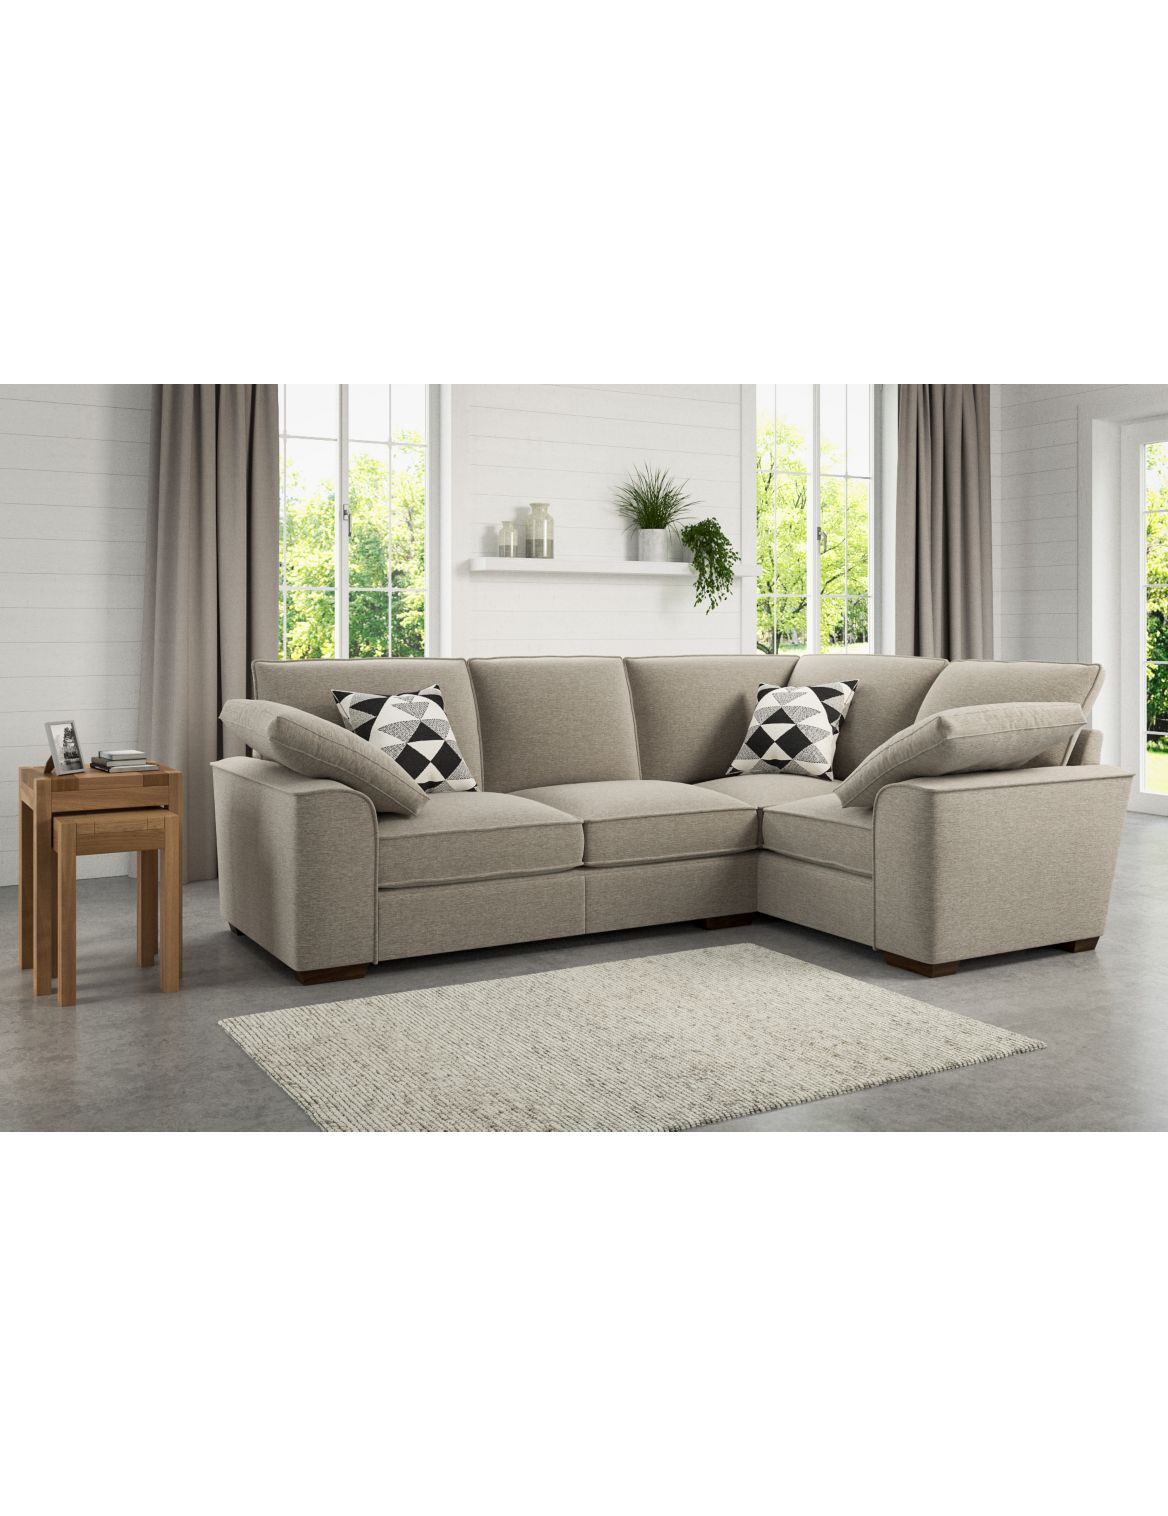 Pleasant Marks Spencer Nantucket Extra Small Corner Sofa Right Creativecarmelina Interior Chair Design Creativecarmelinacom